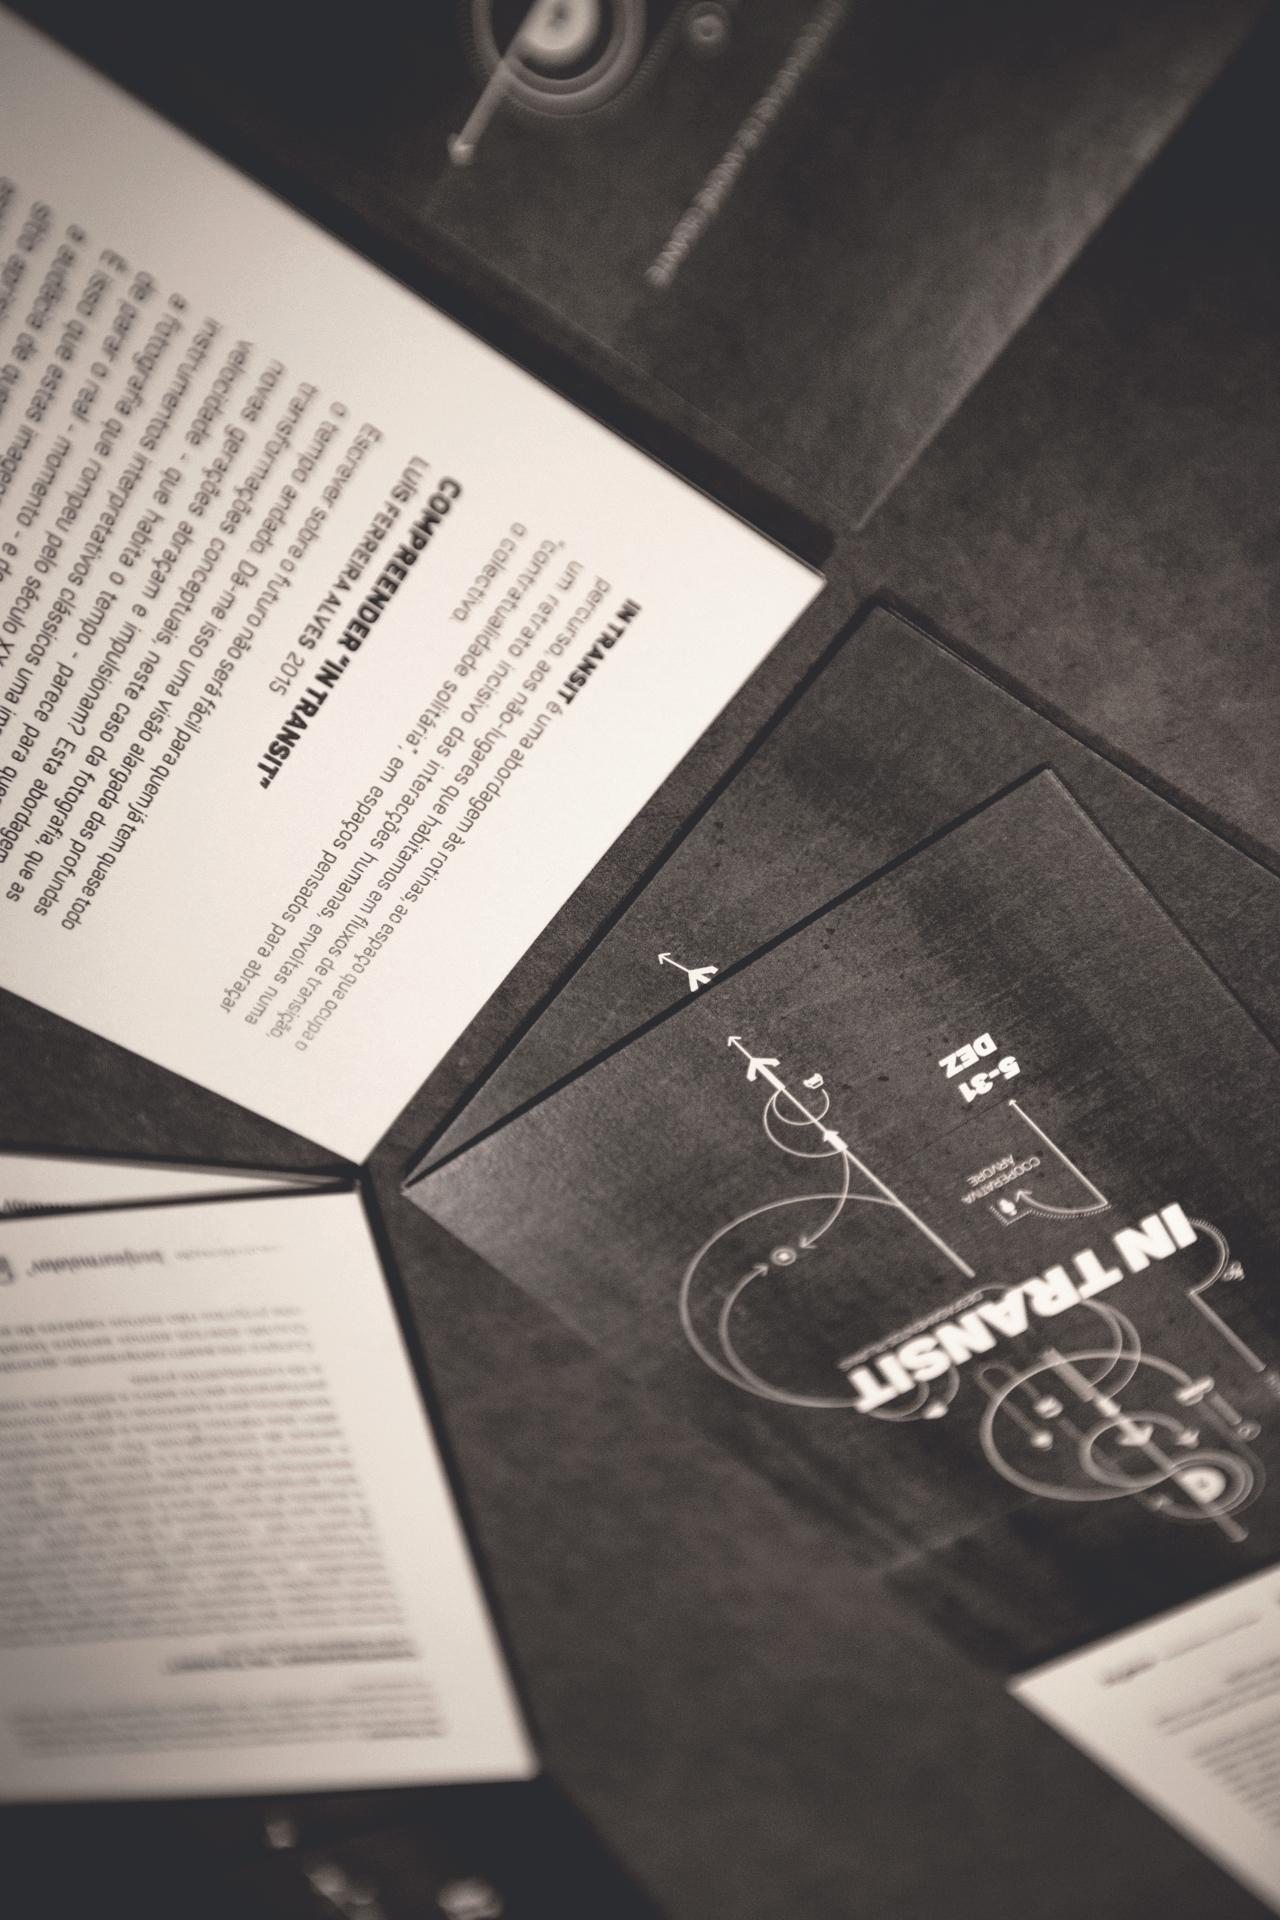 In+Transit+bonjourmolotov+André+Gigante+Experimenta+Design+2015+EXD15+Photography+Exhibition+Exposição+Fotografia+Cooperativa+Árvore+17B N3.jpg